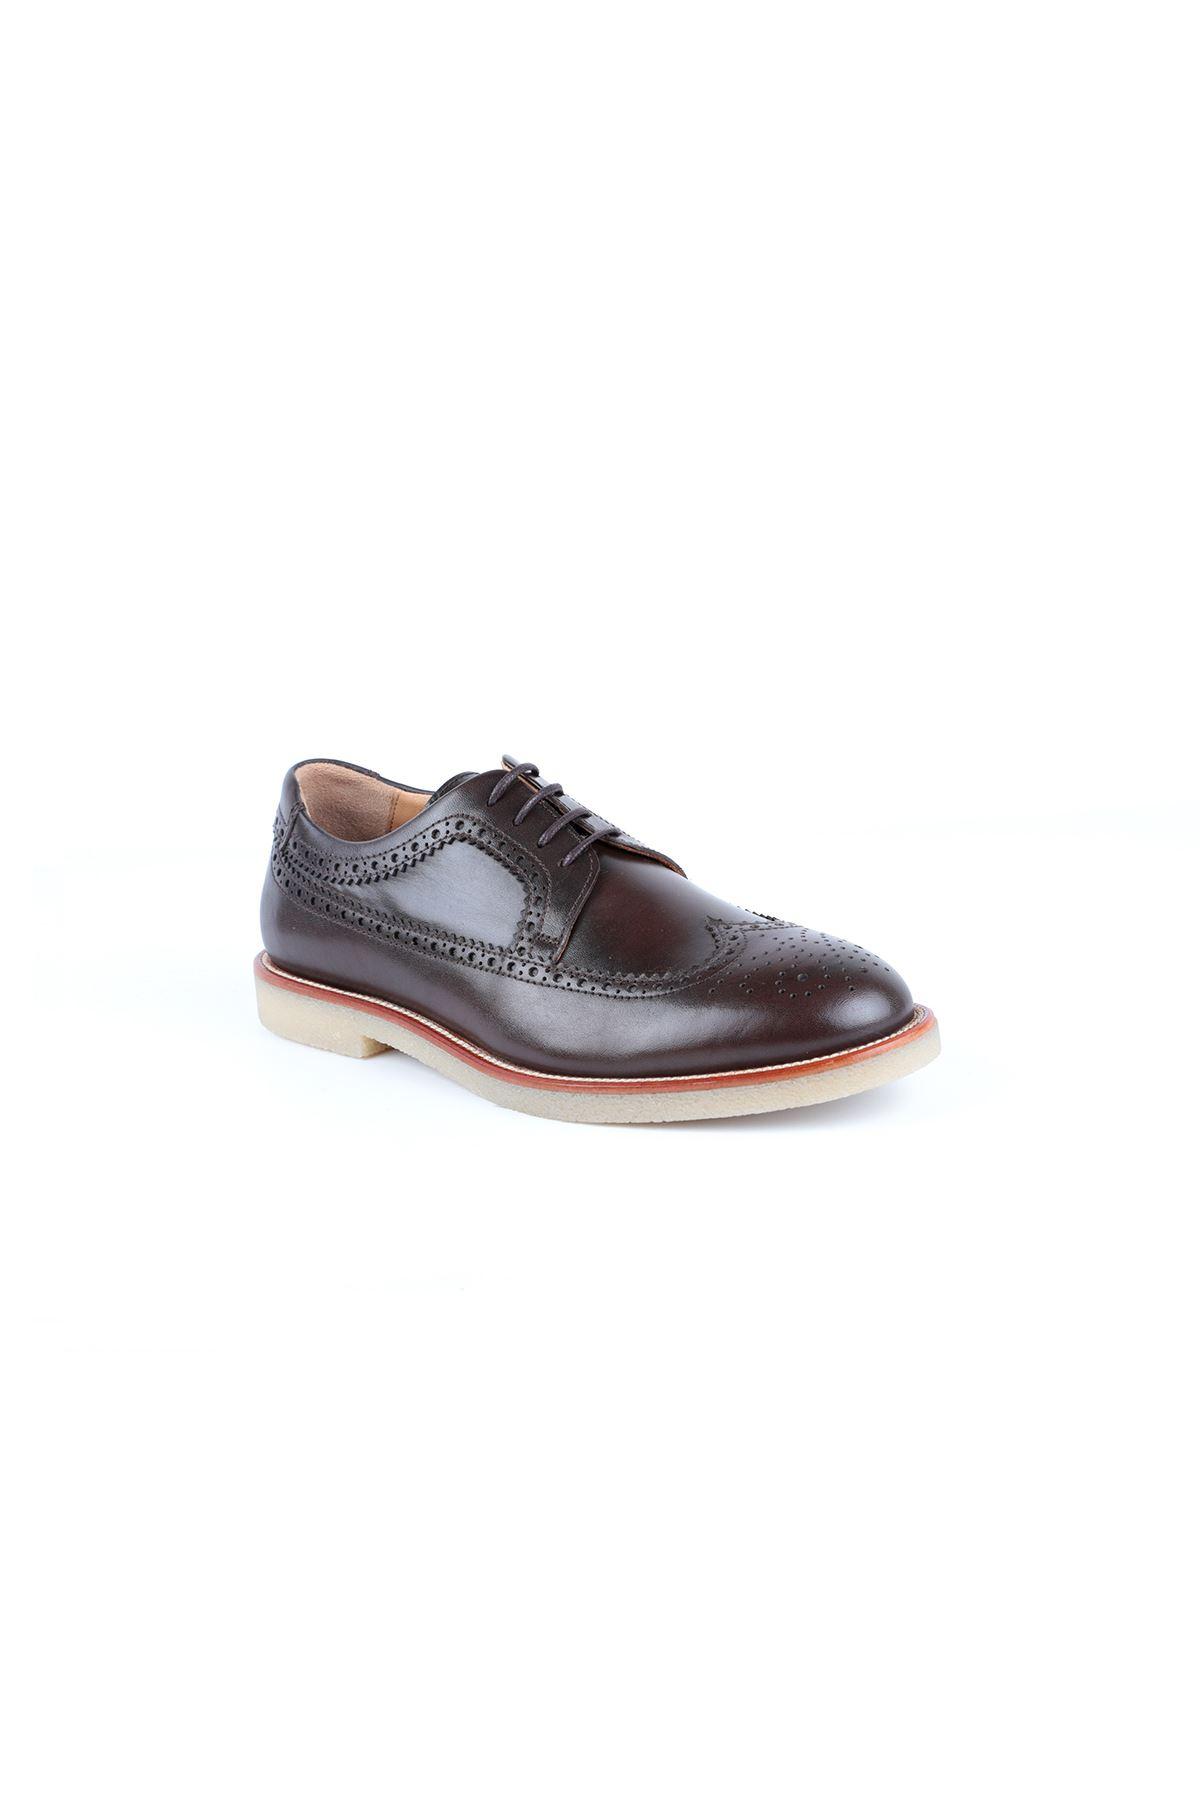 Libero L3743 Brown Casual Men's Shoes